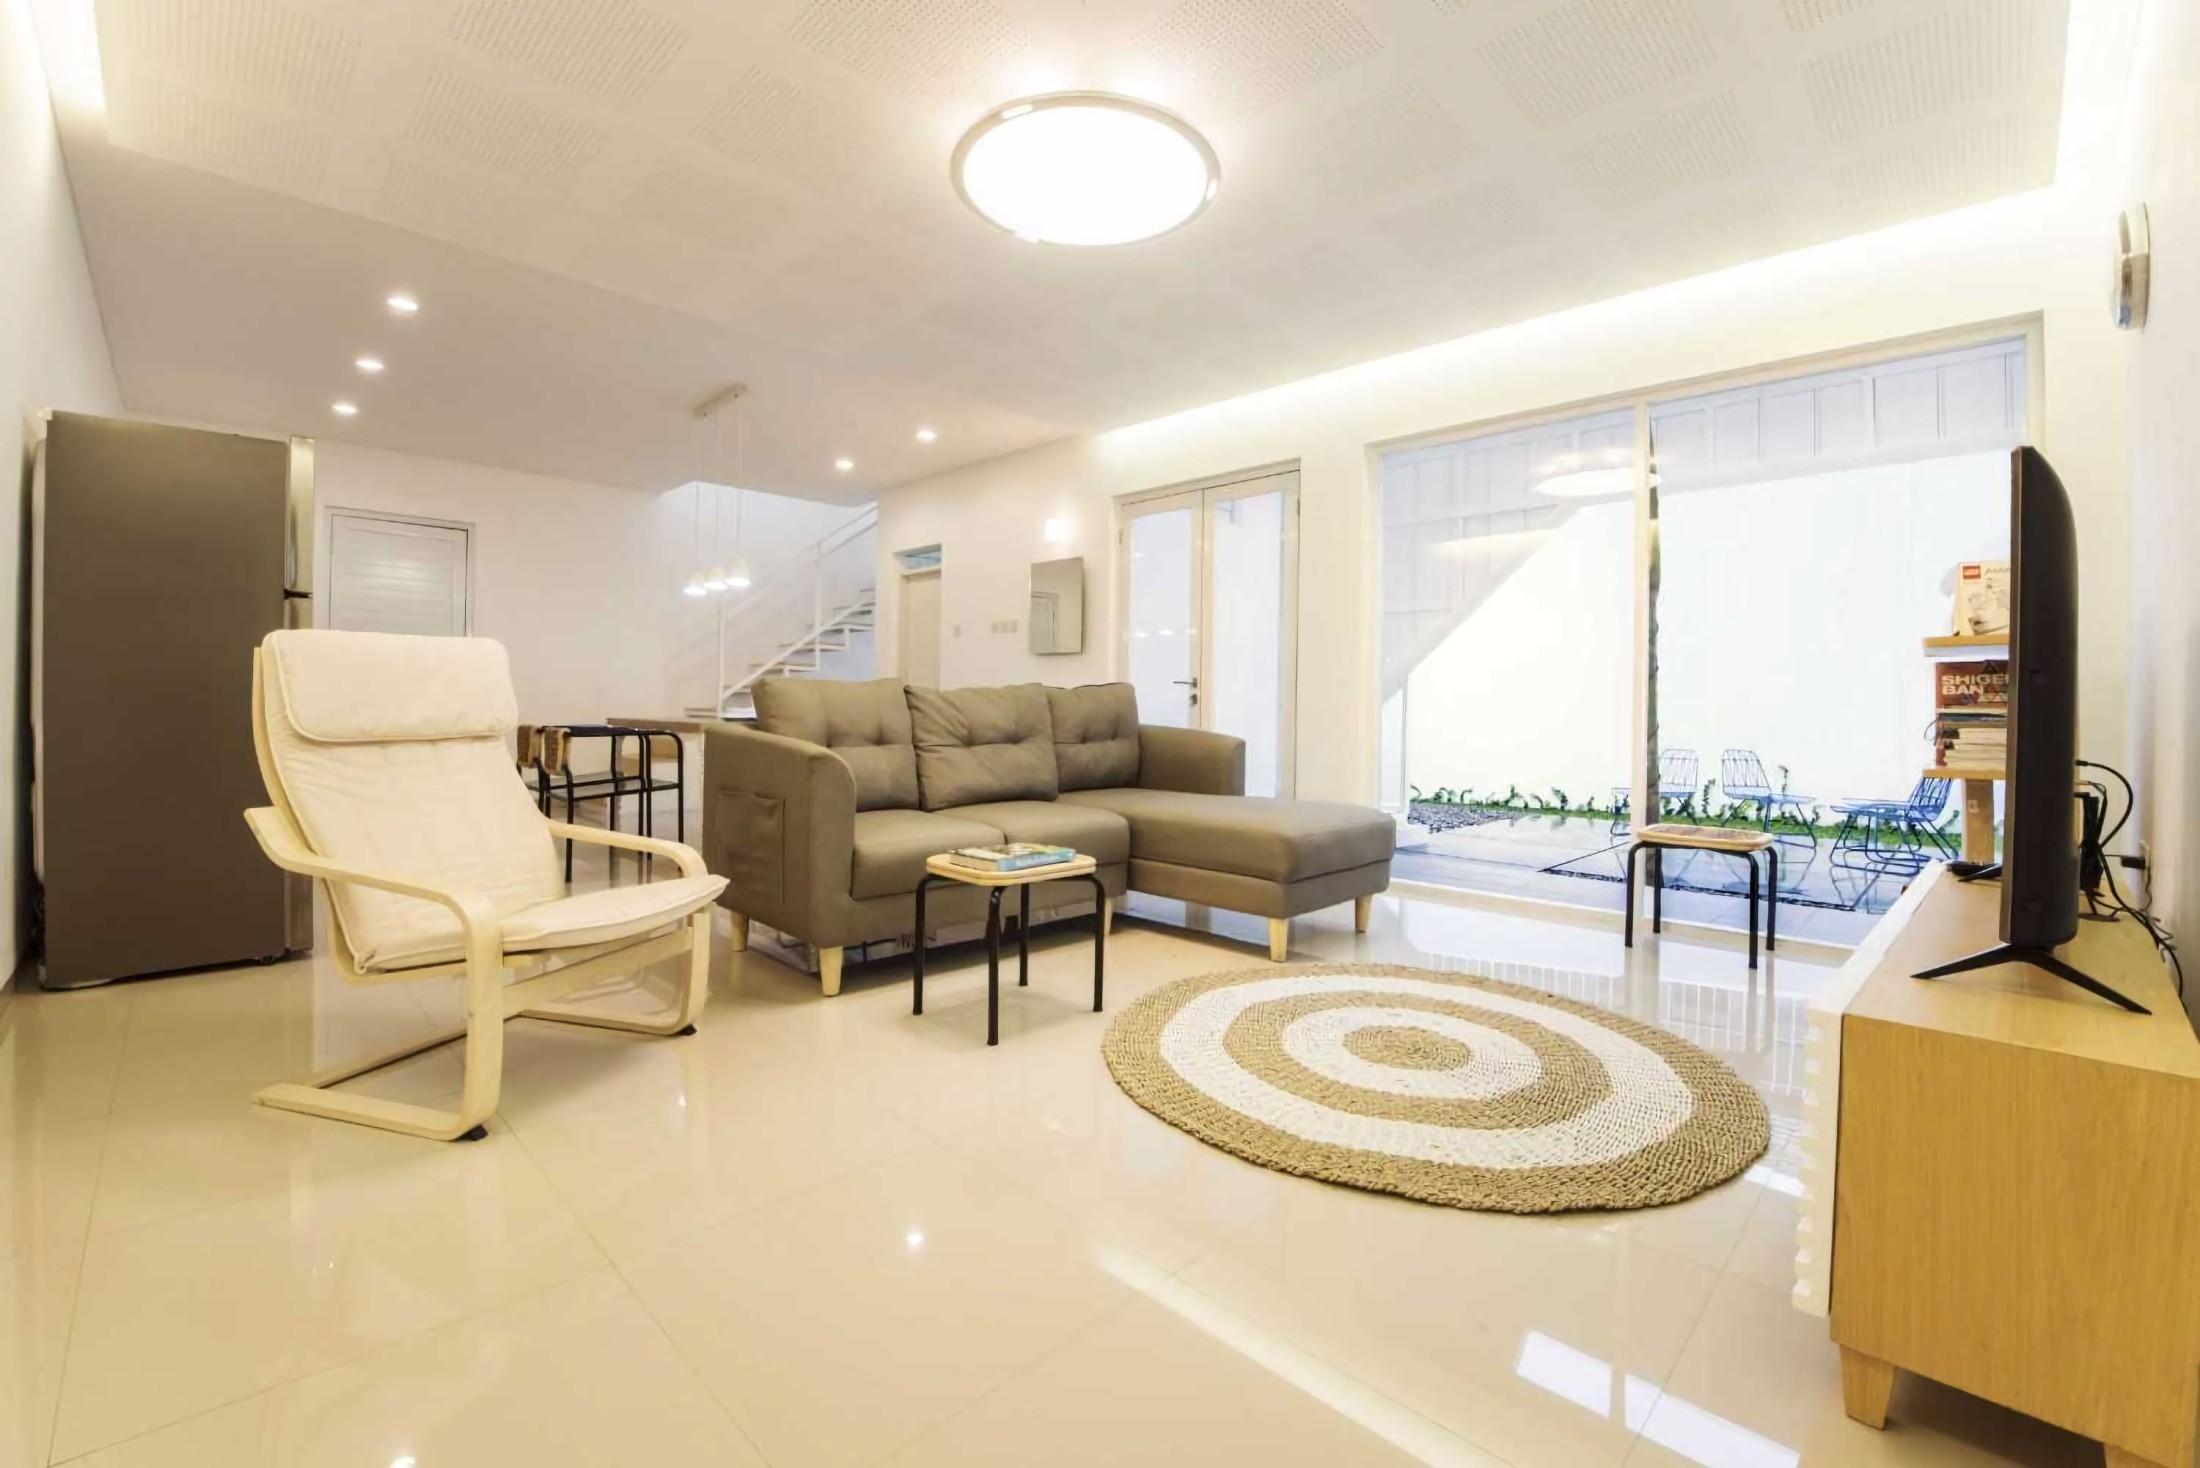 Kenyamanan ruang open-plan dengan aliran udara dan pencahayaan yang terancang dengan baik (Sumber: arsitag.com)